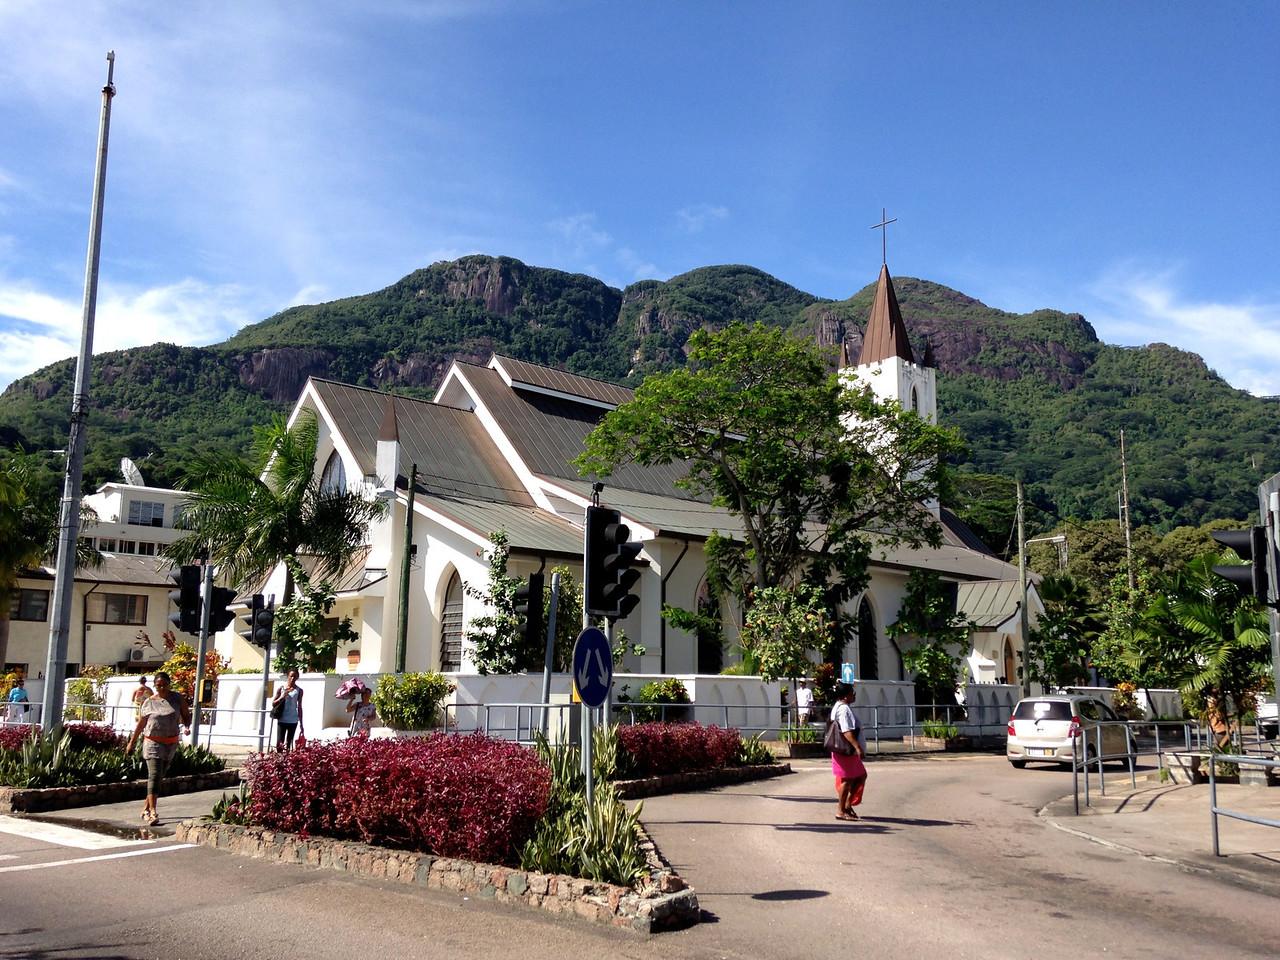 Victoria (capital of Seychelles)